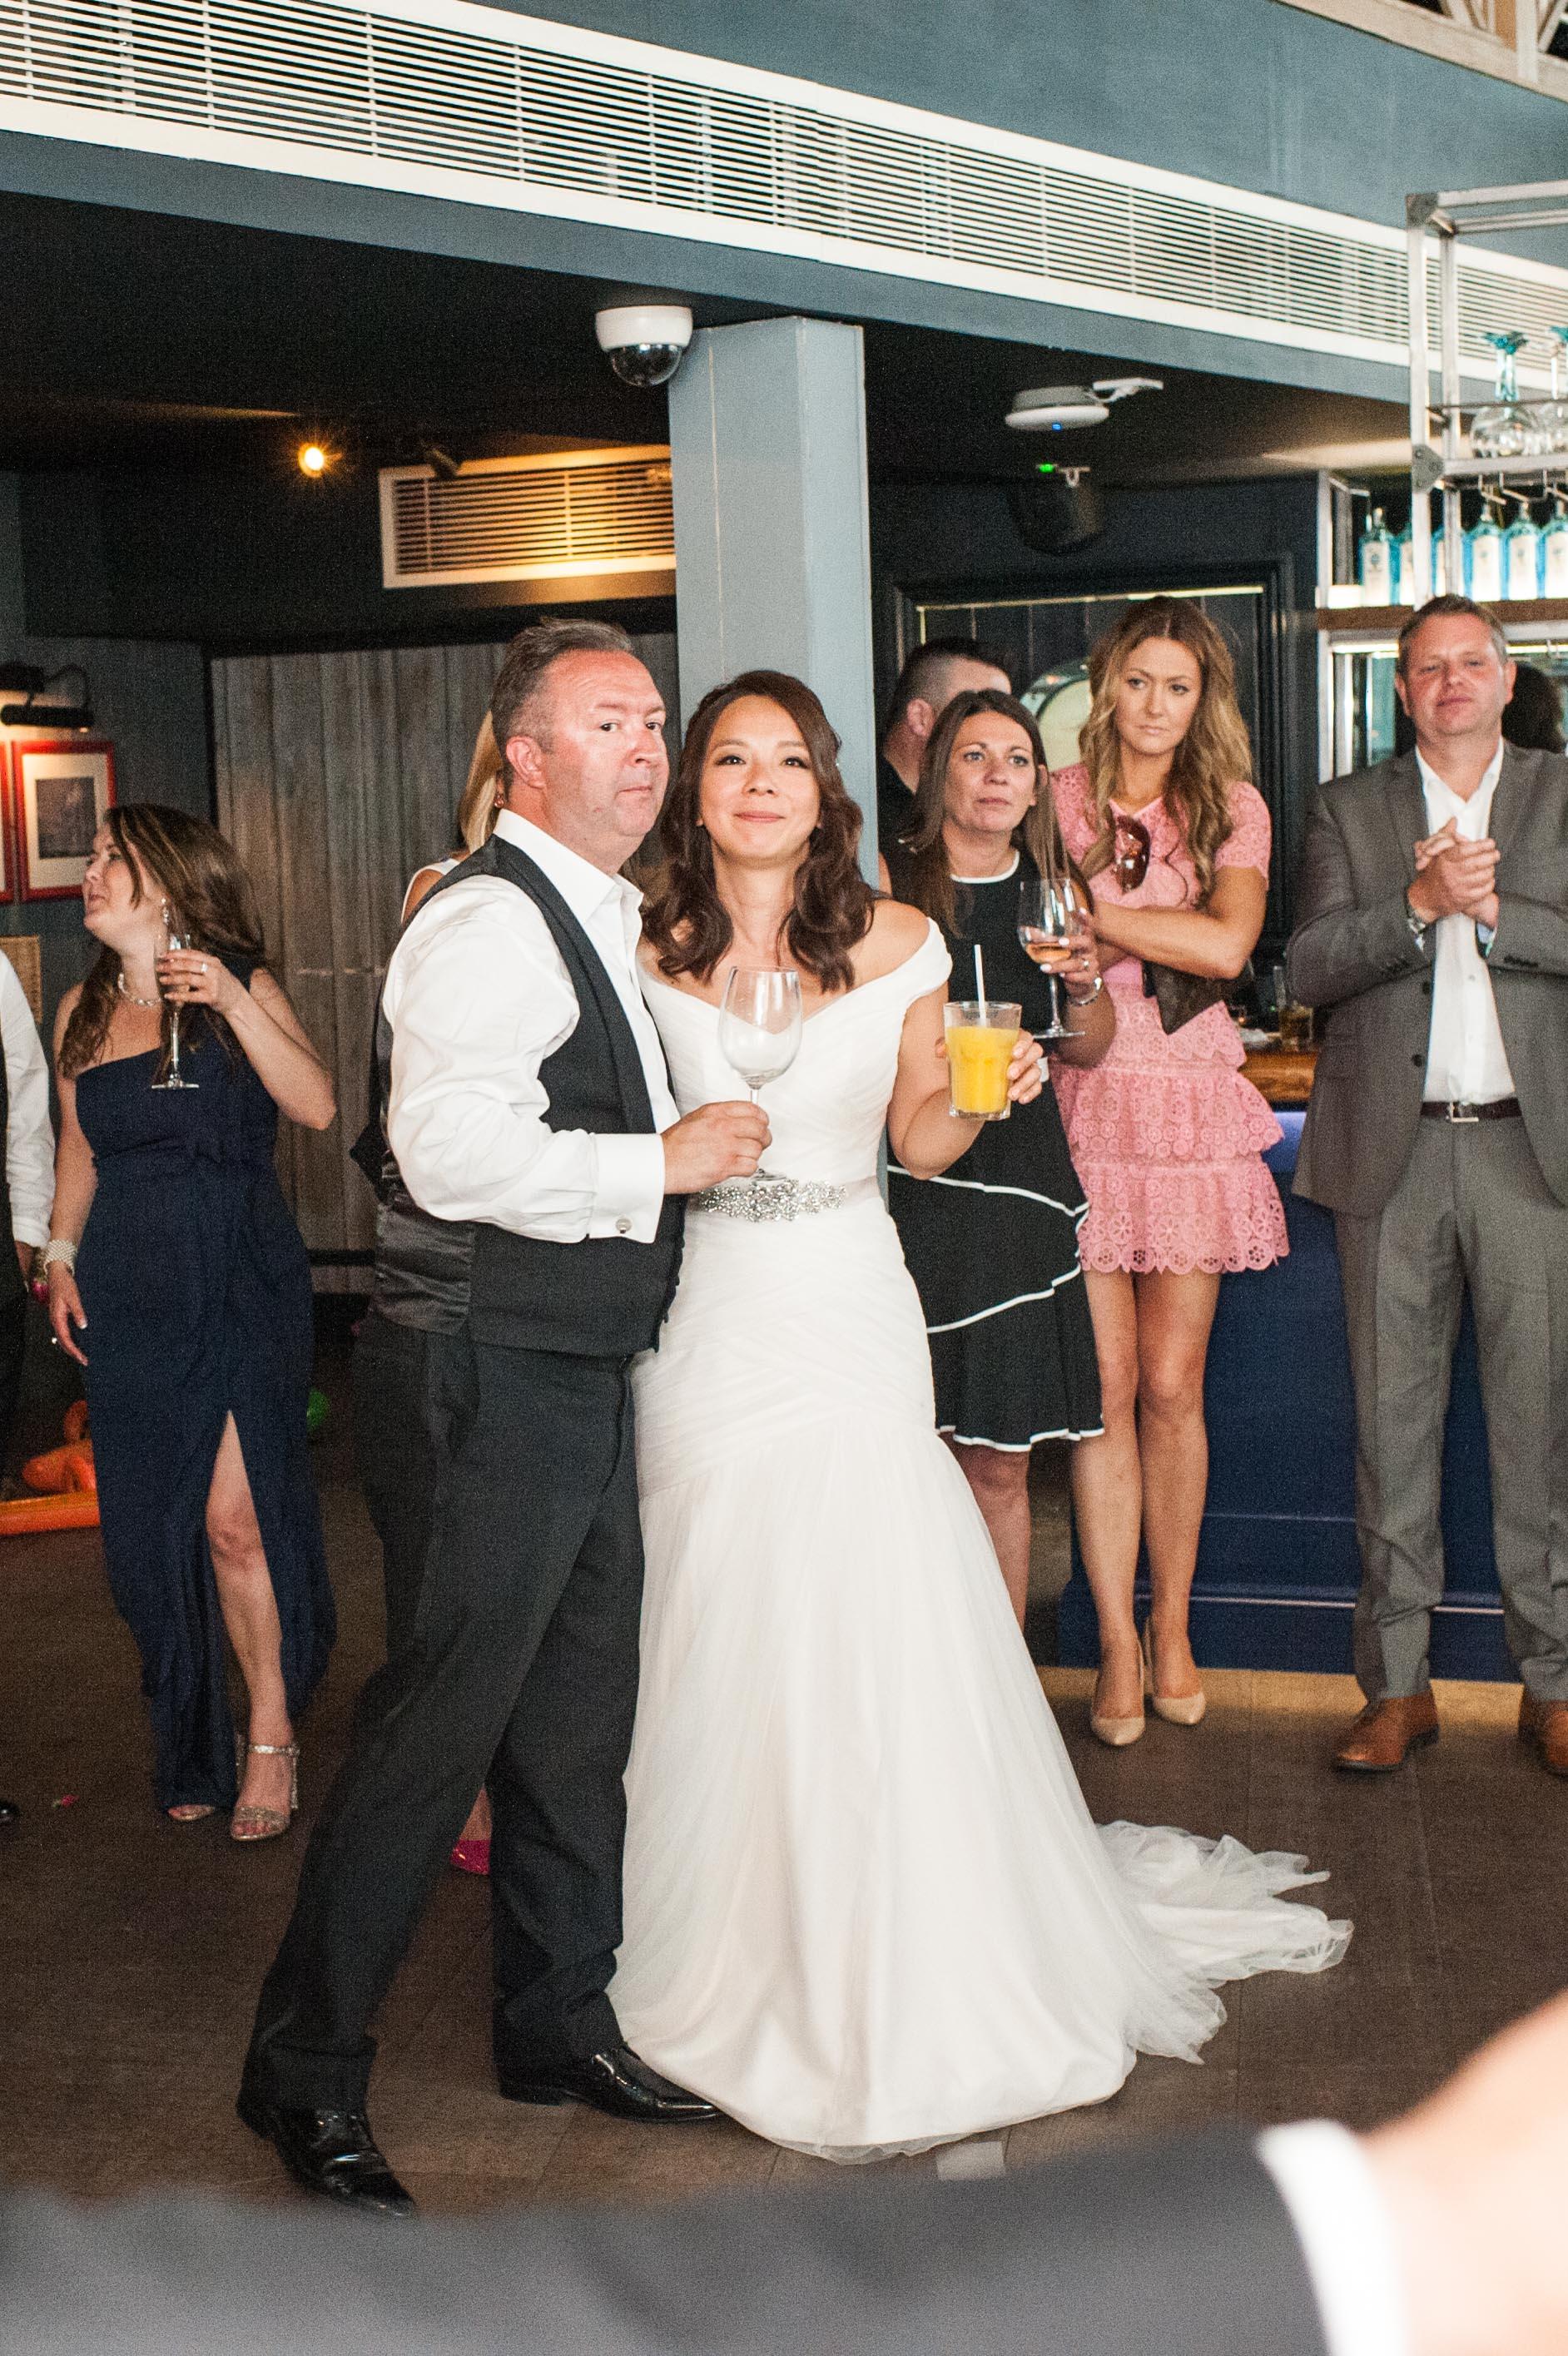 D&M_Marylebone Town Hall Wedding (232 of 239).jpg